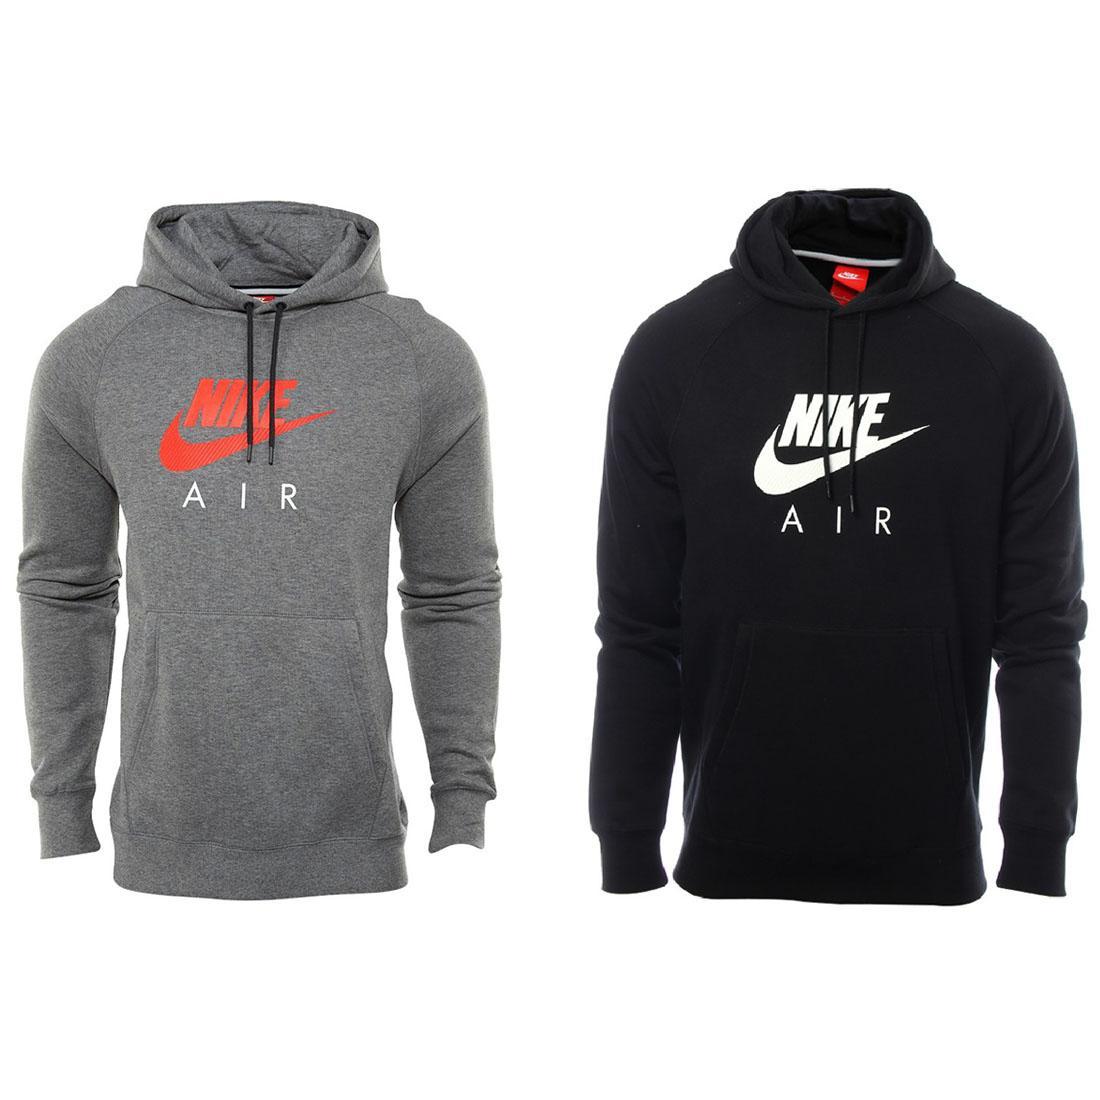 promo code 14405 cd673 Nike Pullover Schwarz Herren